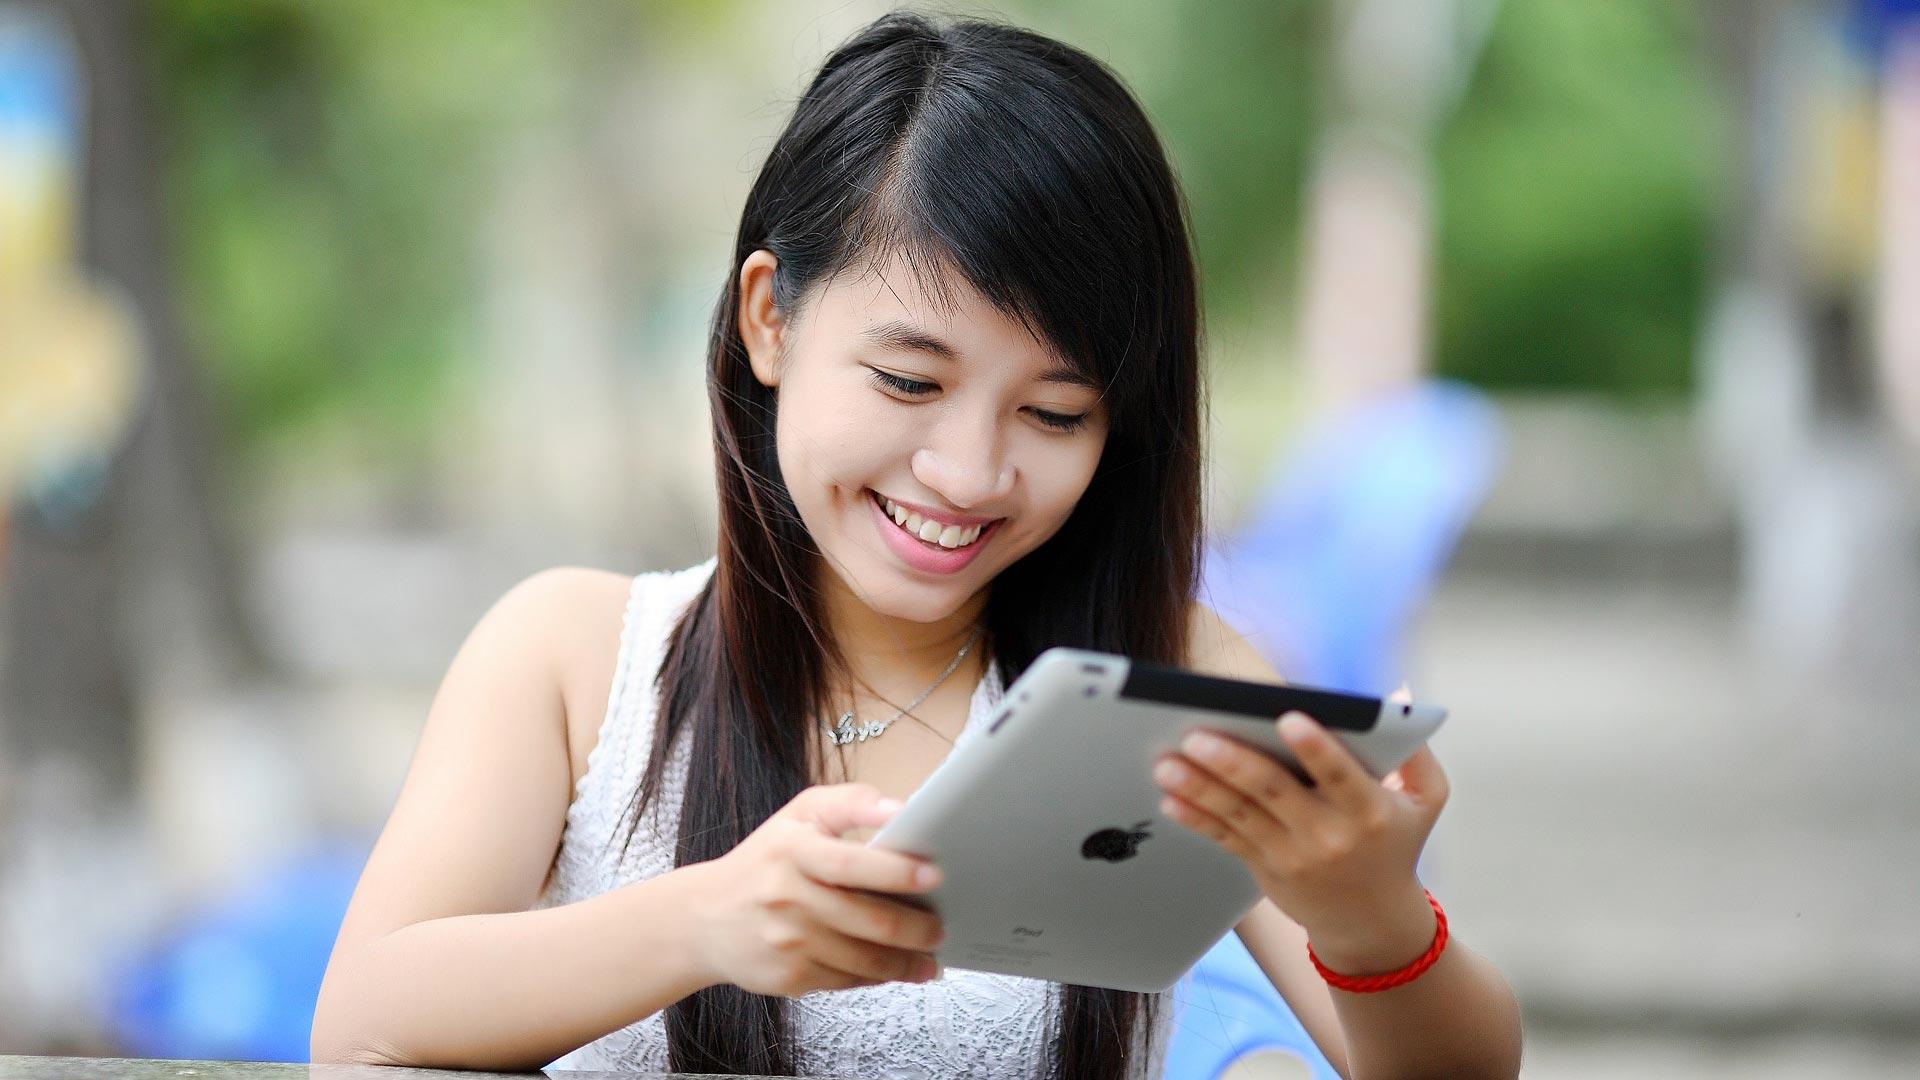 tablet-happy-woman.jpg